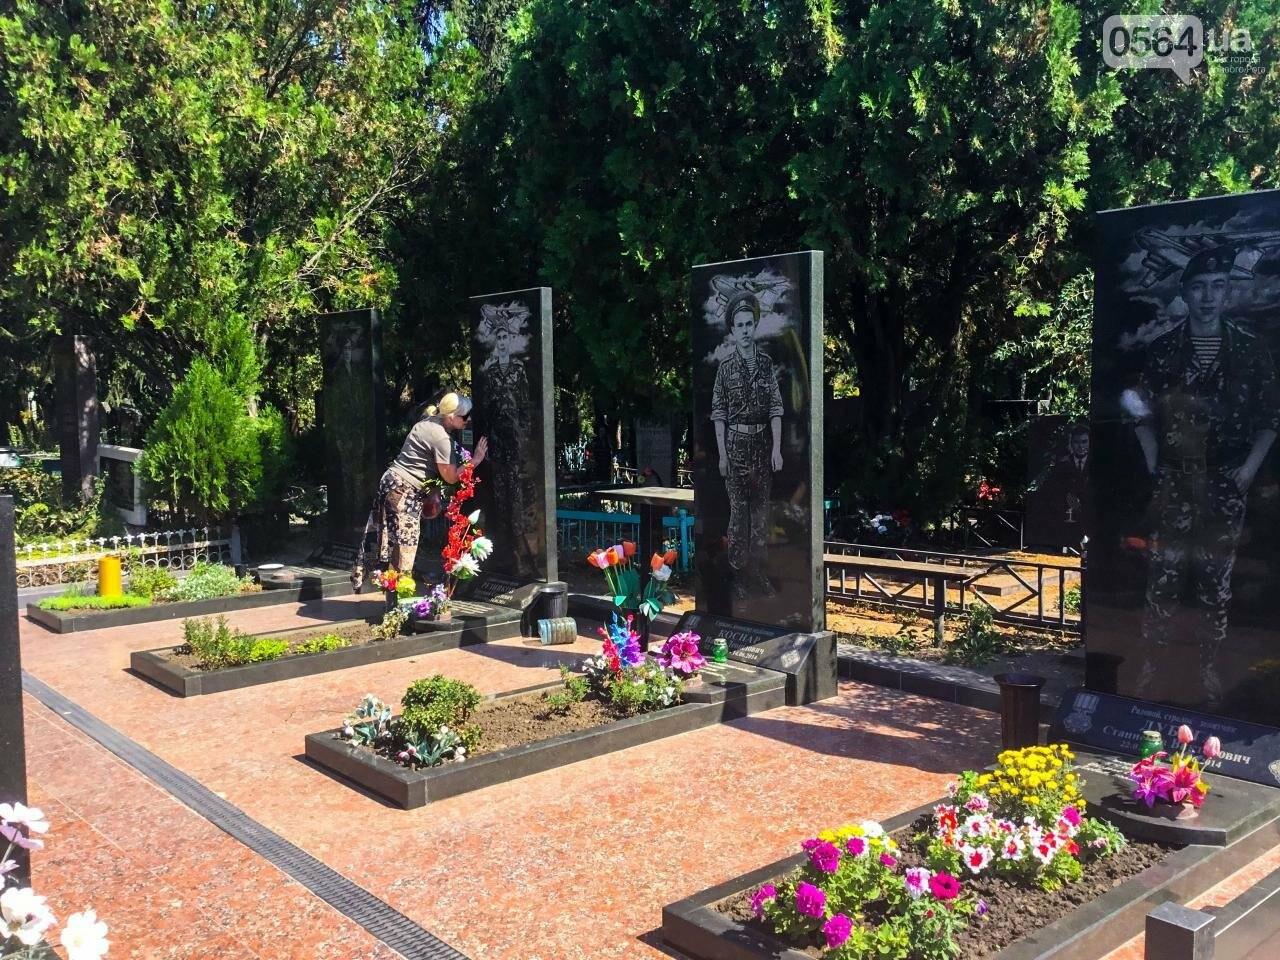 На Аллее Героев провели панихиду по погибшим в зоне АТО криворожанам, - ФОТО , фото-25